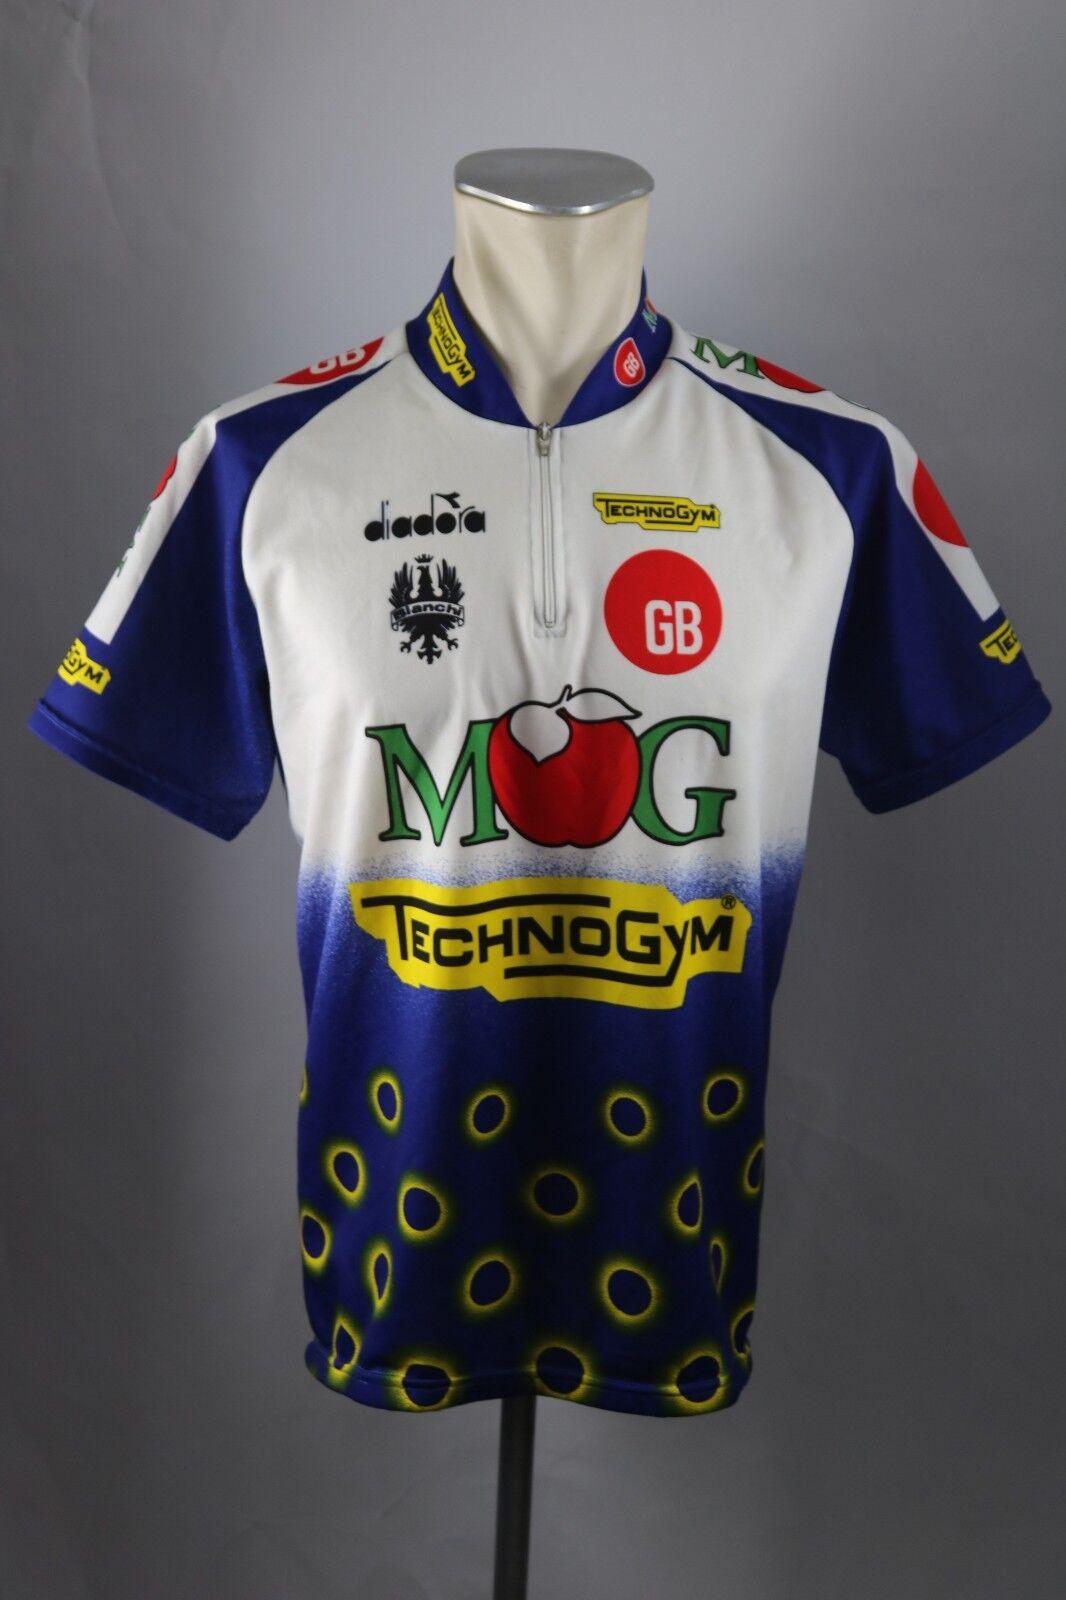 Diadora MOG TechnoGym Bianchi Rad Trikot XL XL XL XXL BW 59cm Bike cycling jersey S5 2d3268